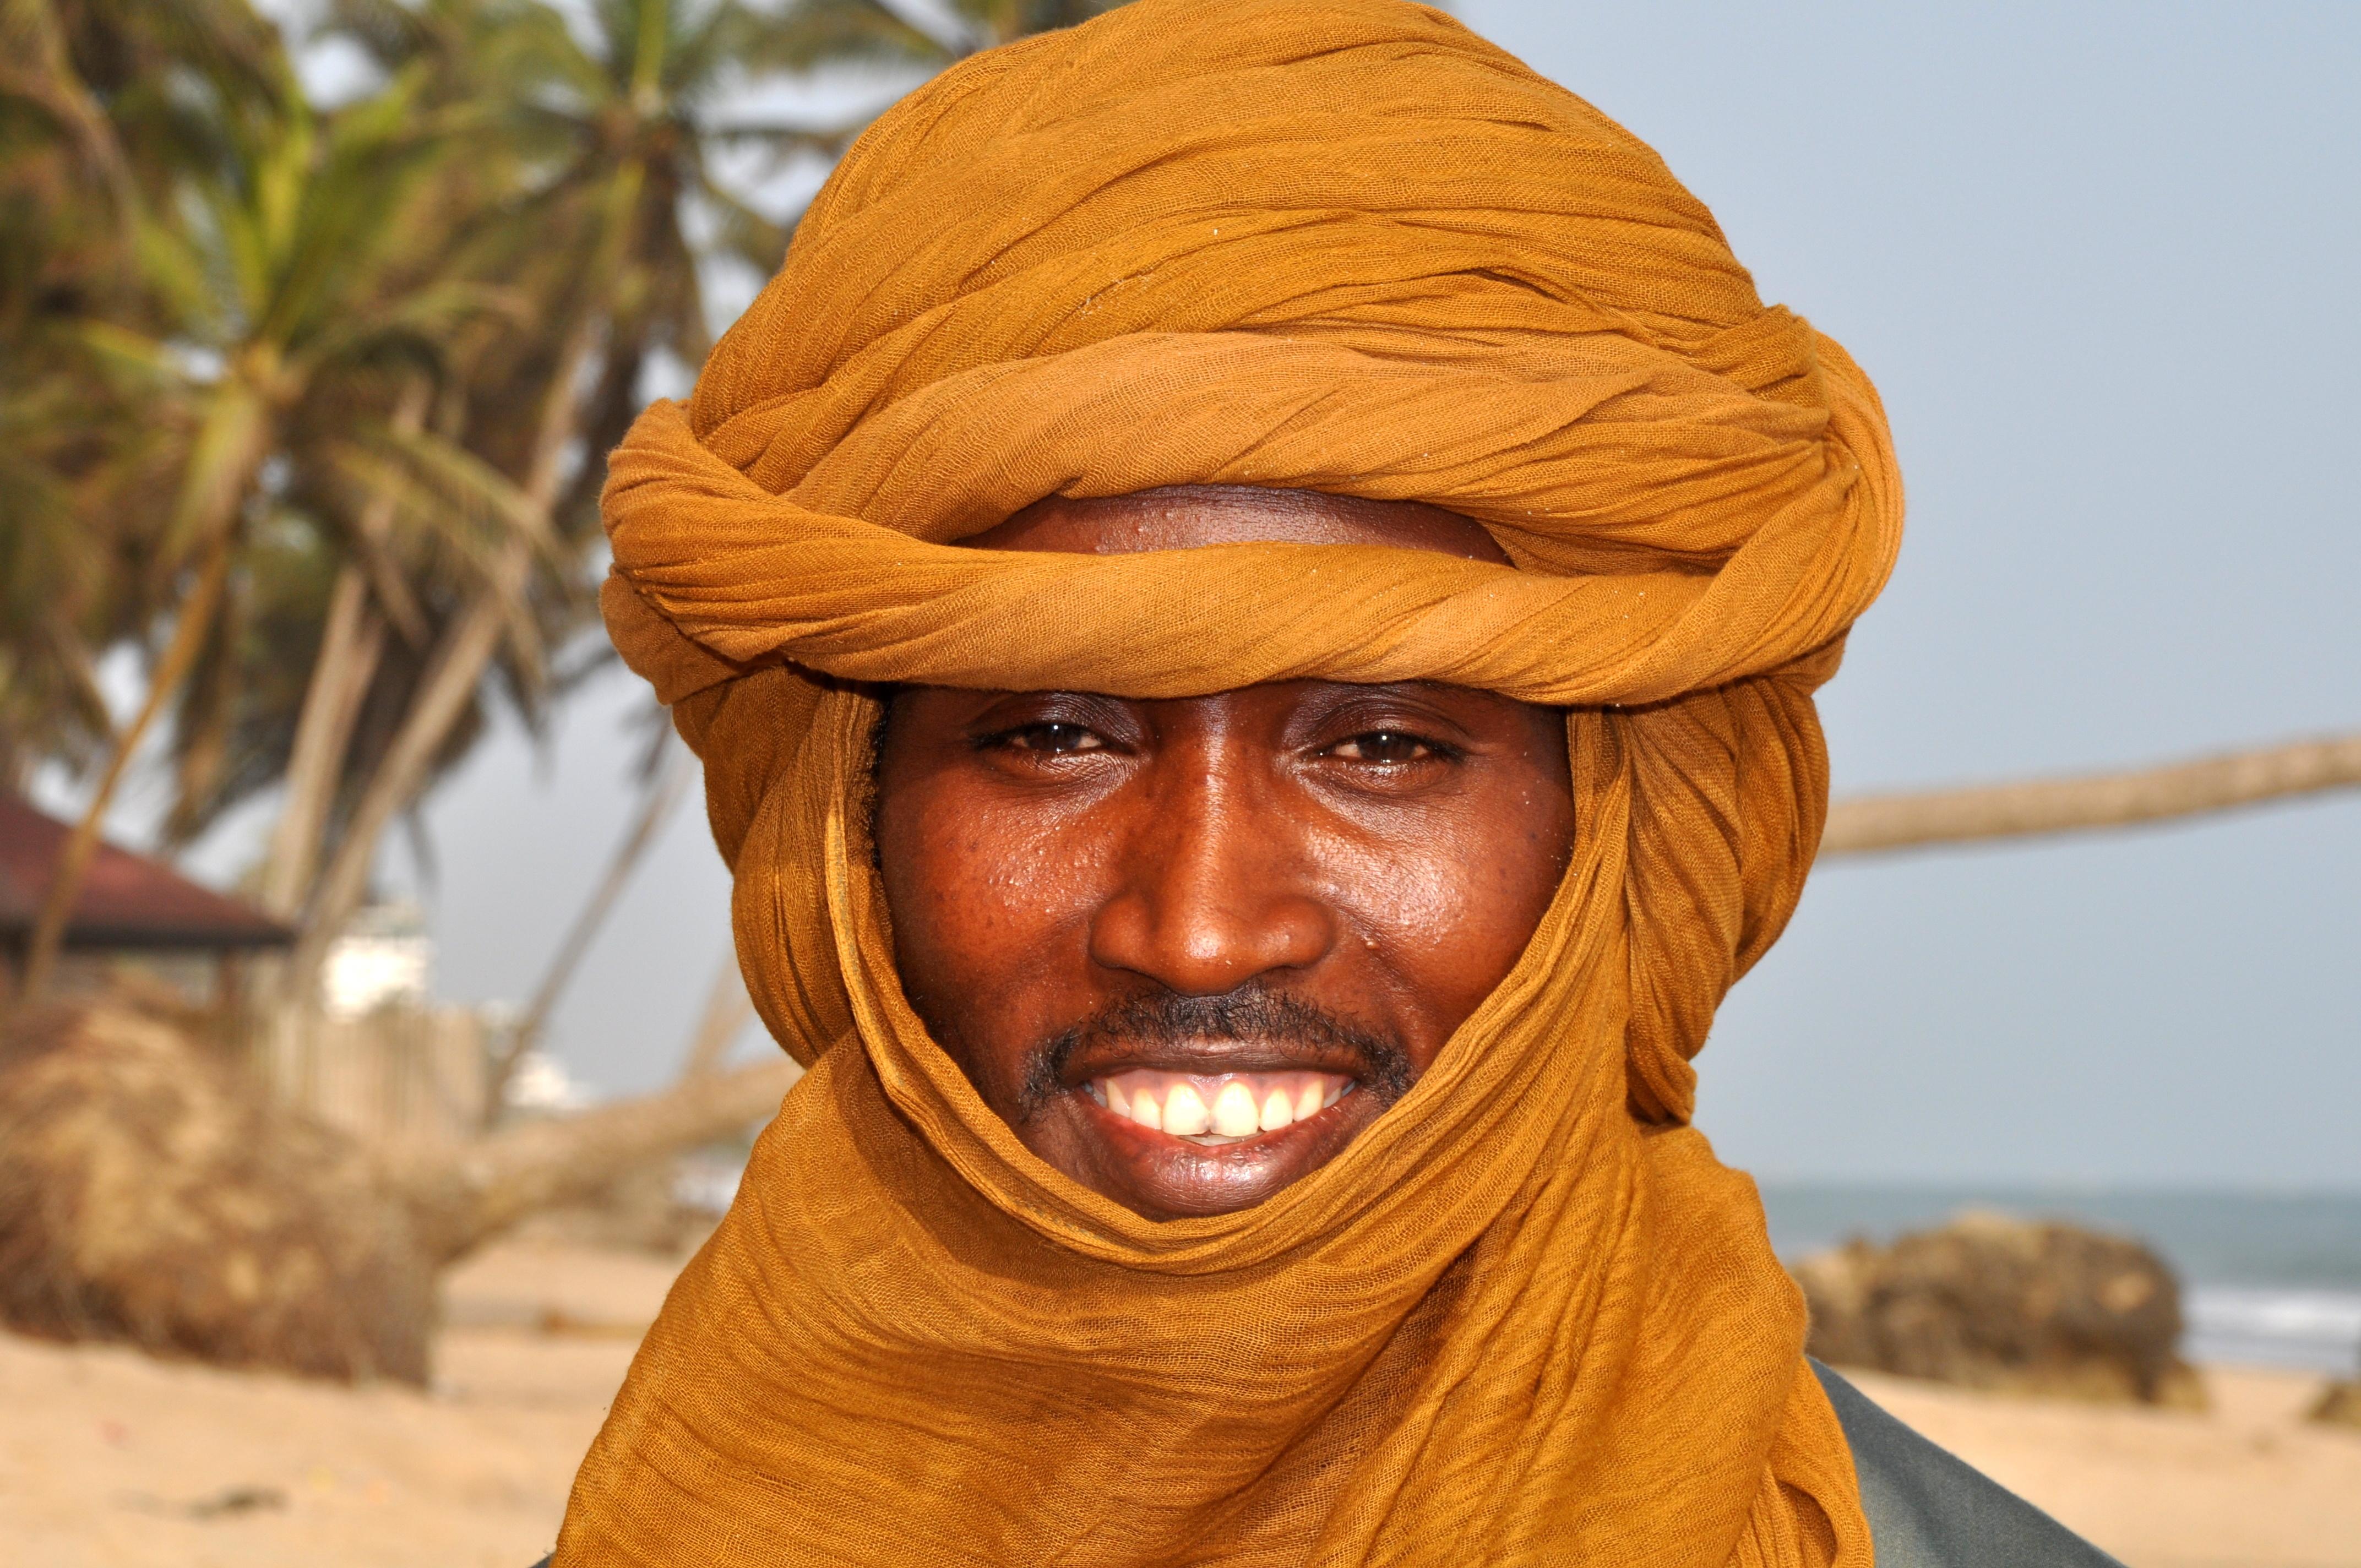 Morocco Man